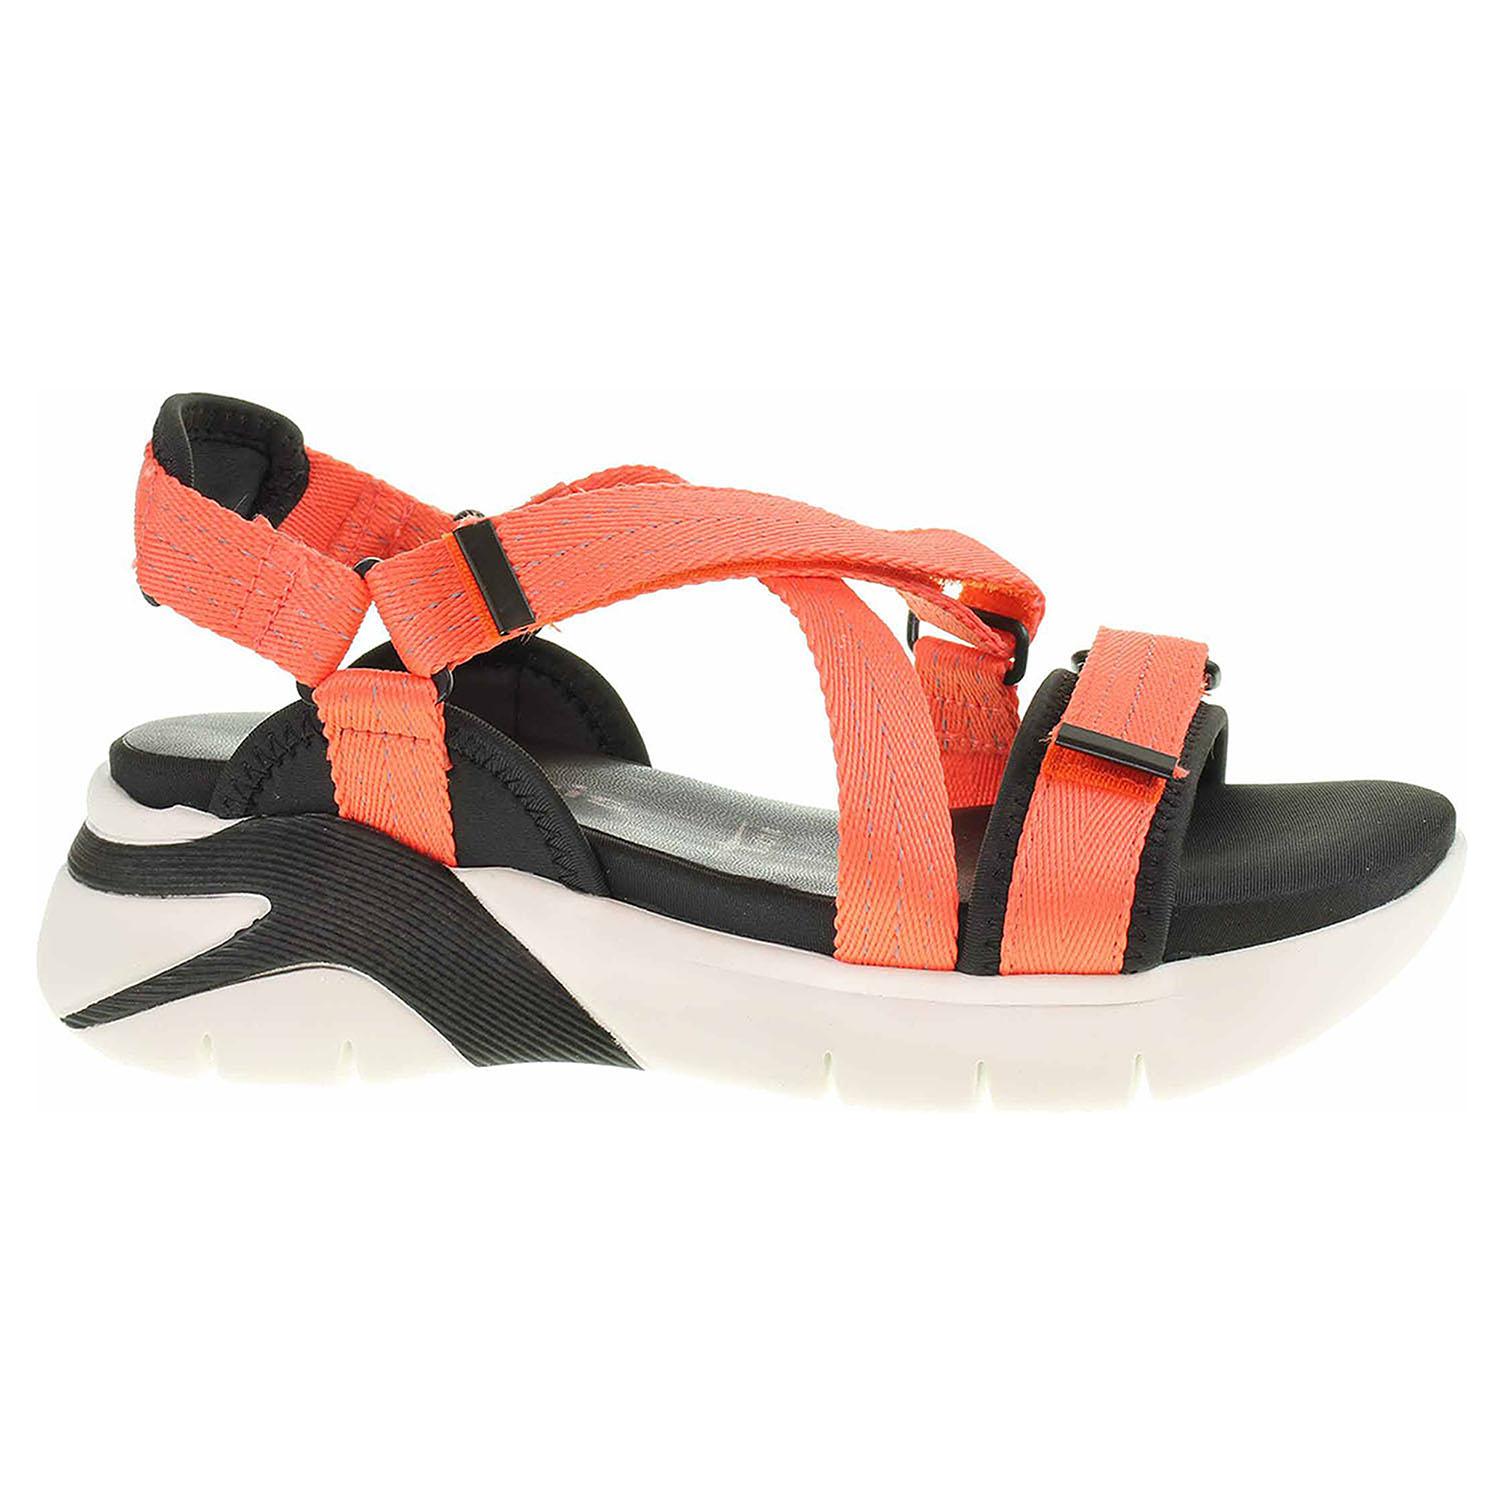 Levně Dámské sandály Tamaris 1-28709-34 peach neon 37